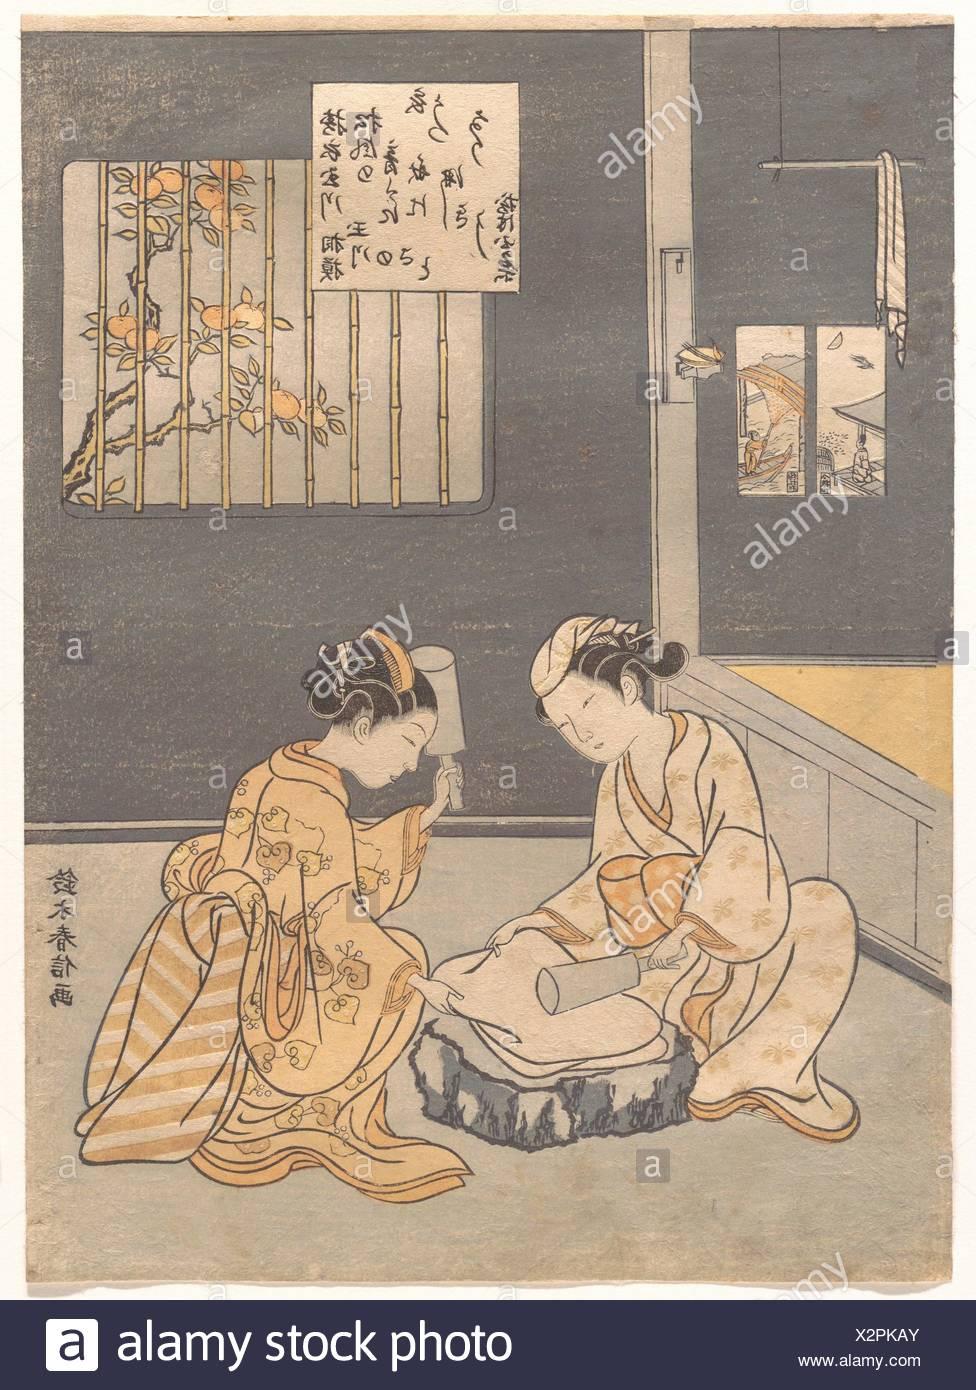 Koromo Uchi Tamagawa/Fulling Cloth at the Jewel River (Kinuta no Tamagawa). Artist: Suzuki Harunobu (Japanese, 1725-1770); Period: Edo period - Stock Image